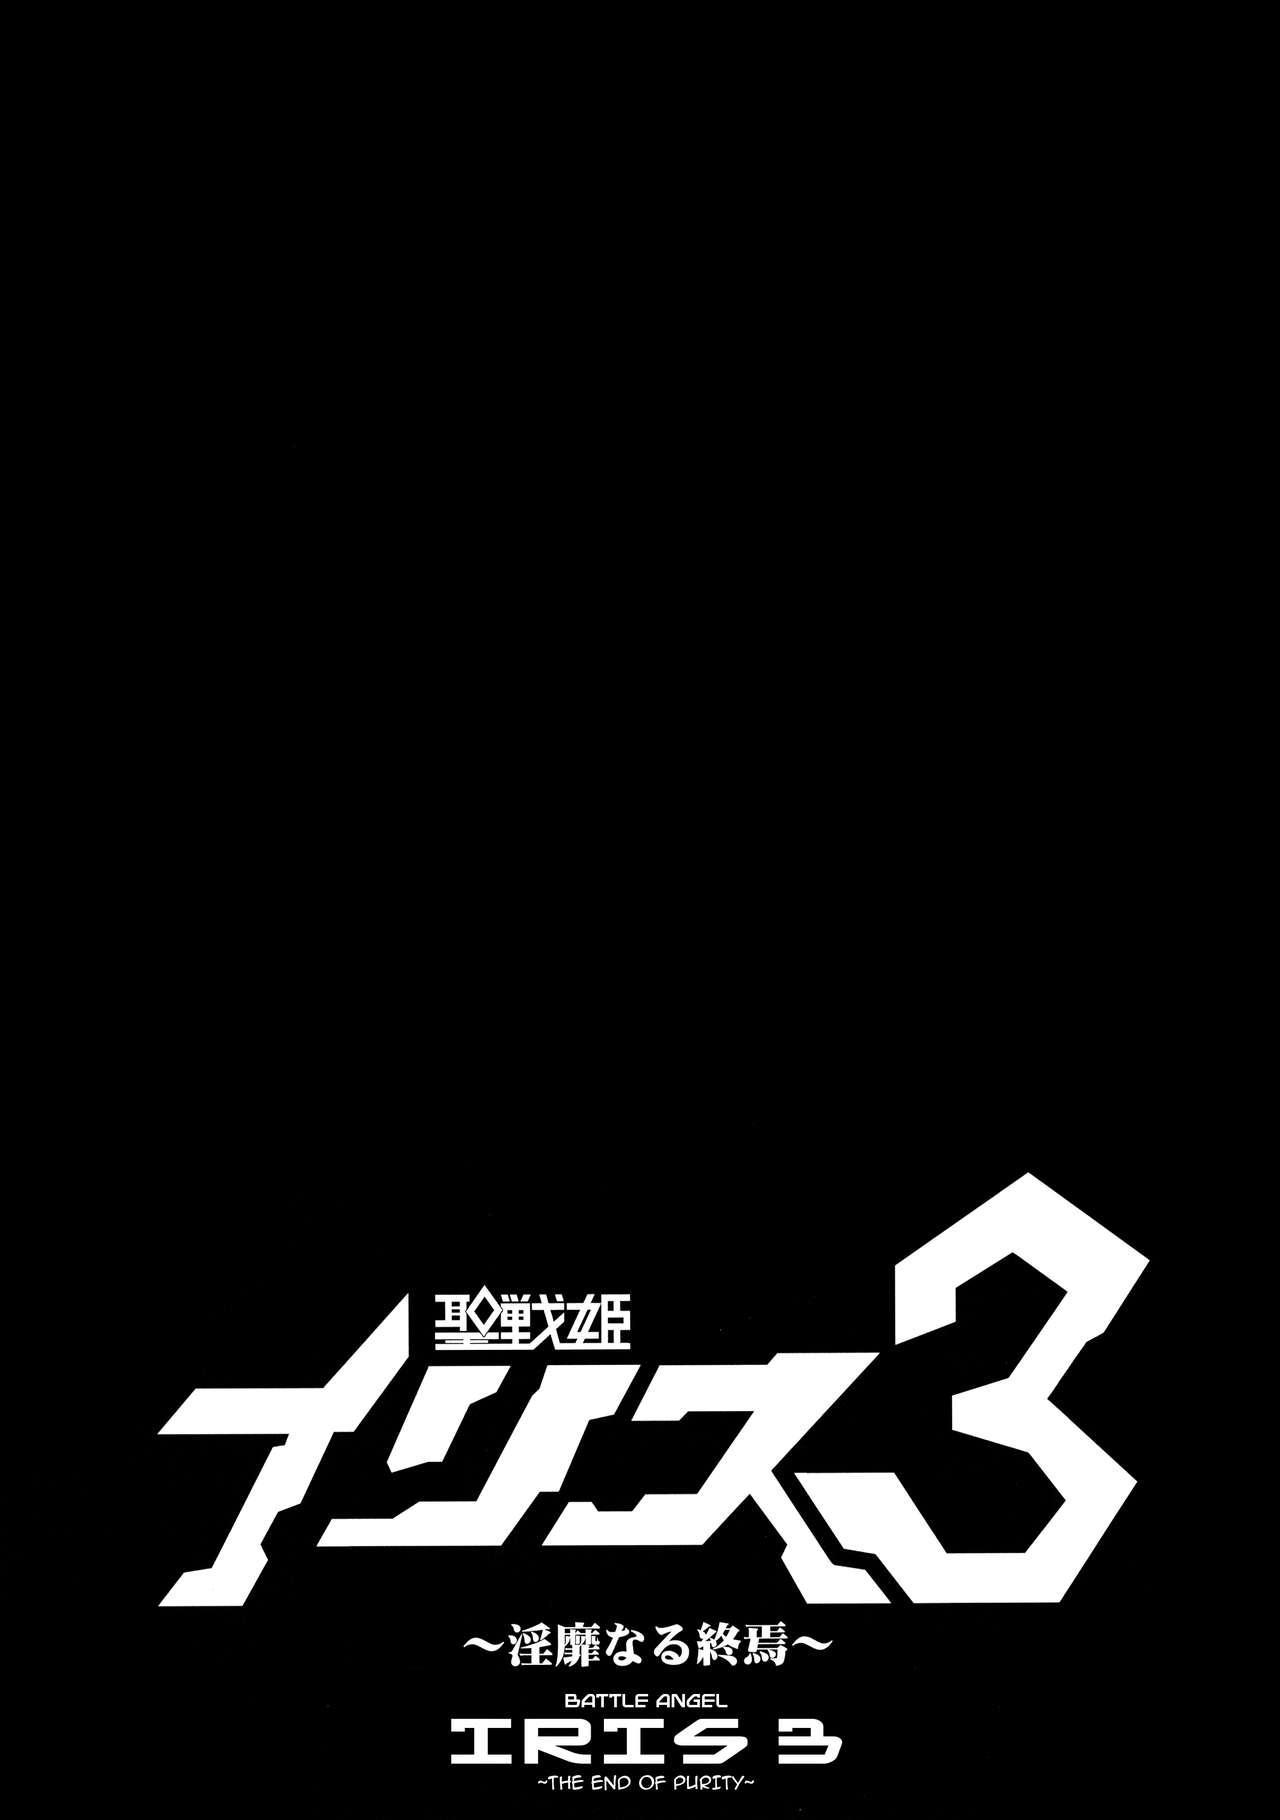 (C94) [Ikameshi Shokudou (Ikameshi)] Seisenki Iris 3 ~Inbinaru Shuuen~ | Battle Angel Iris 3 ~The End of Purity~ [English] {darknight} 26